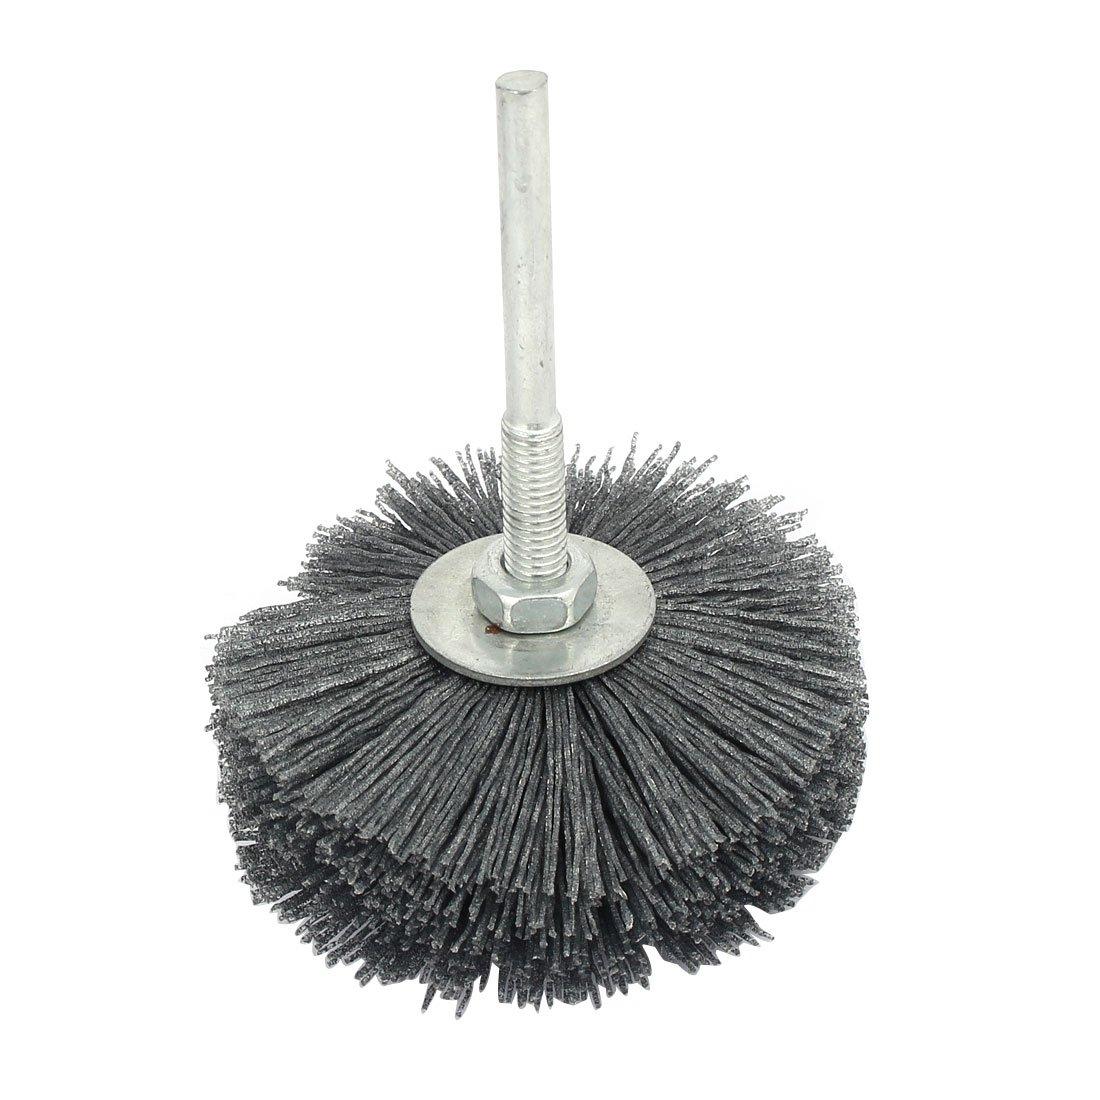 uxcell 6mm Shank 80mm Dia Head 320 Grit Abrasive Wheel Brush Grinding Tool Gray